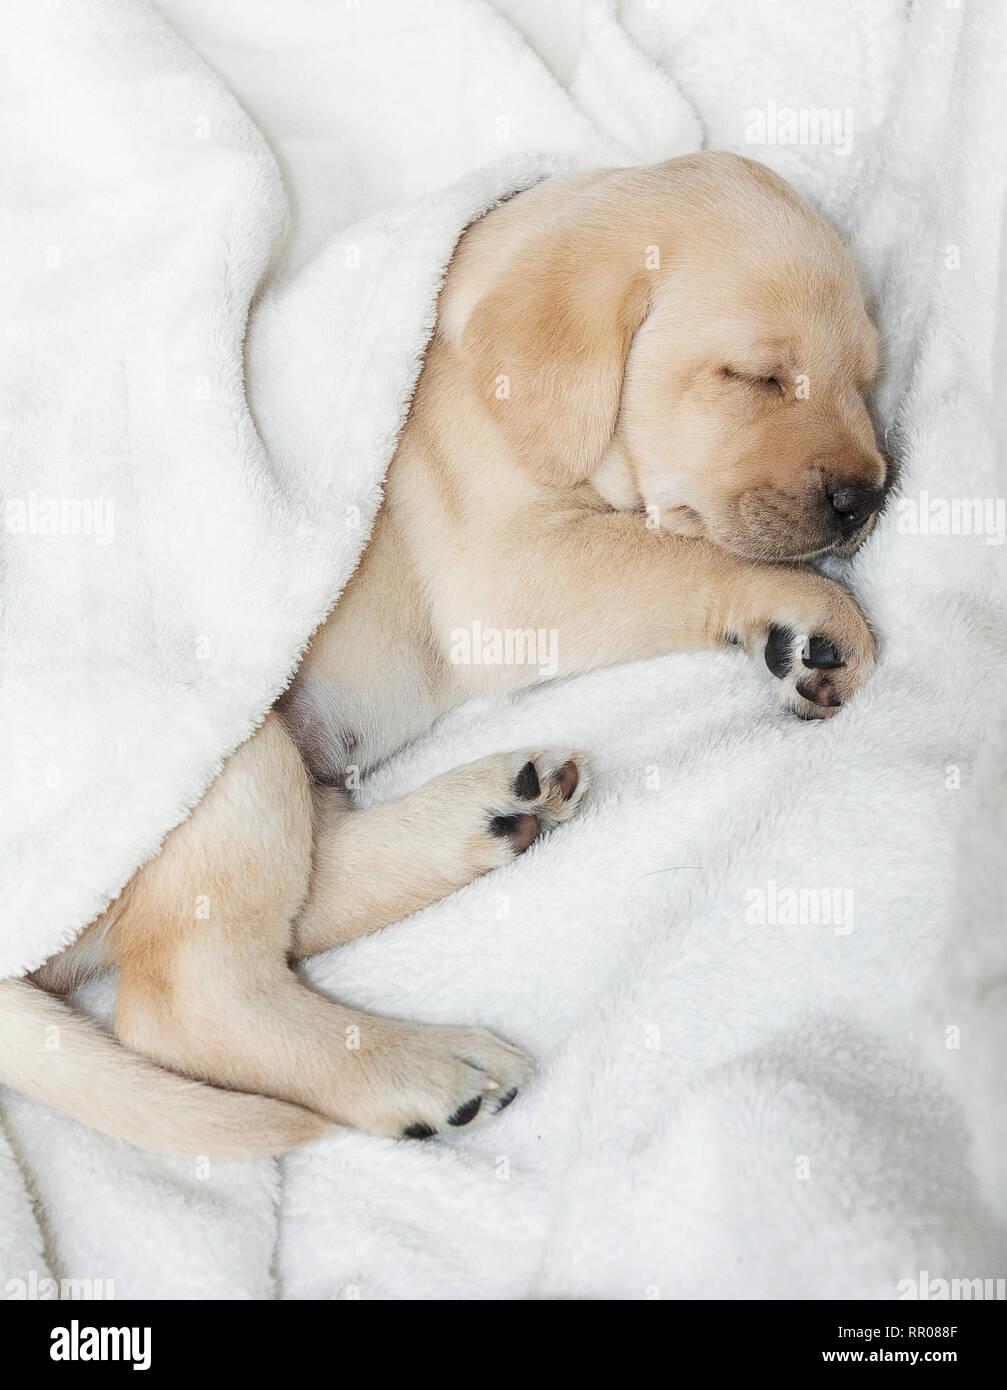 Golden Yellow Labrador Dog Puppy Stock Photo Alamy